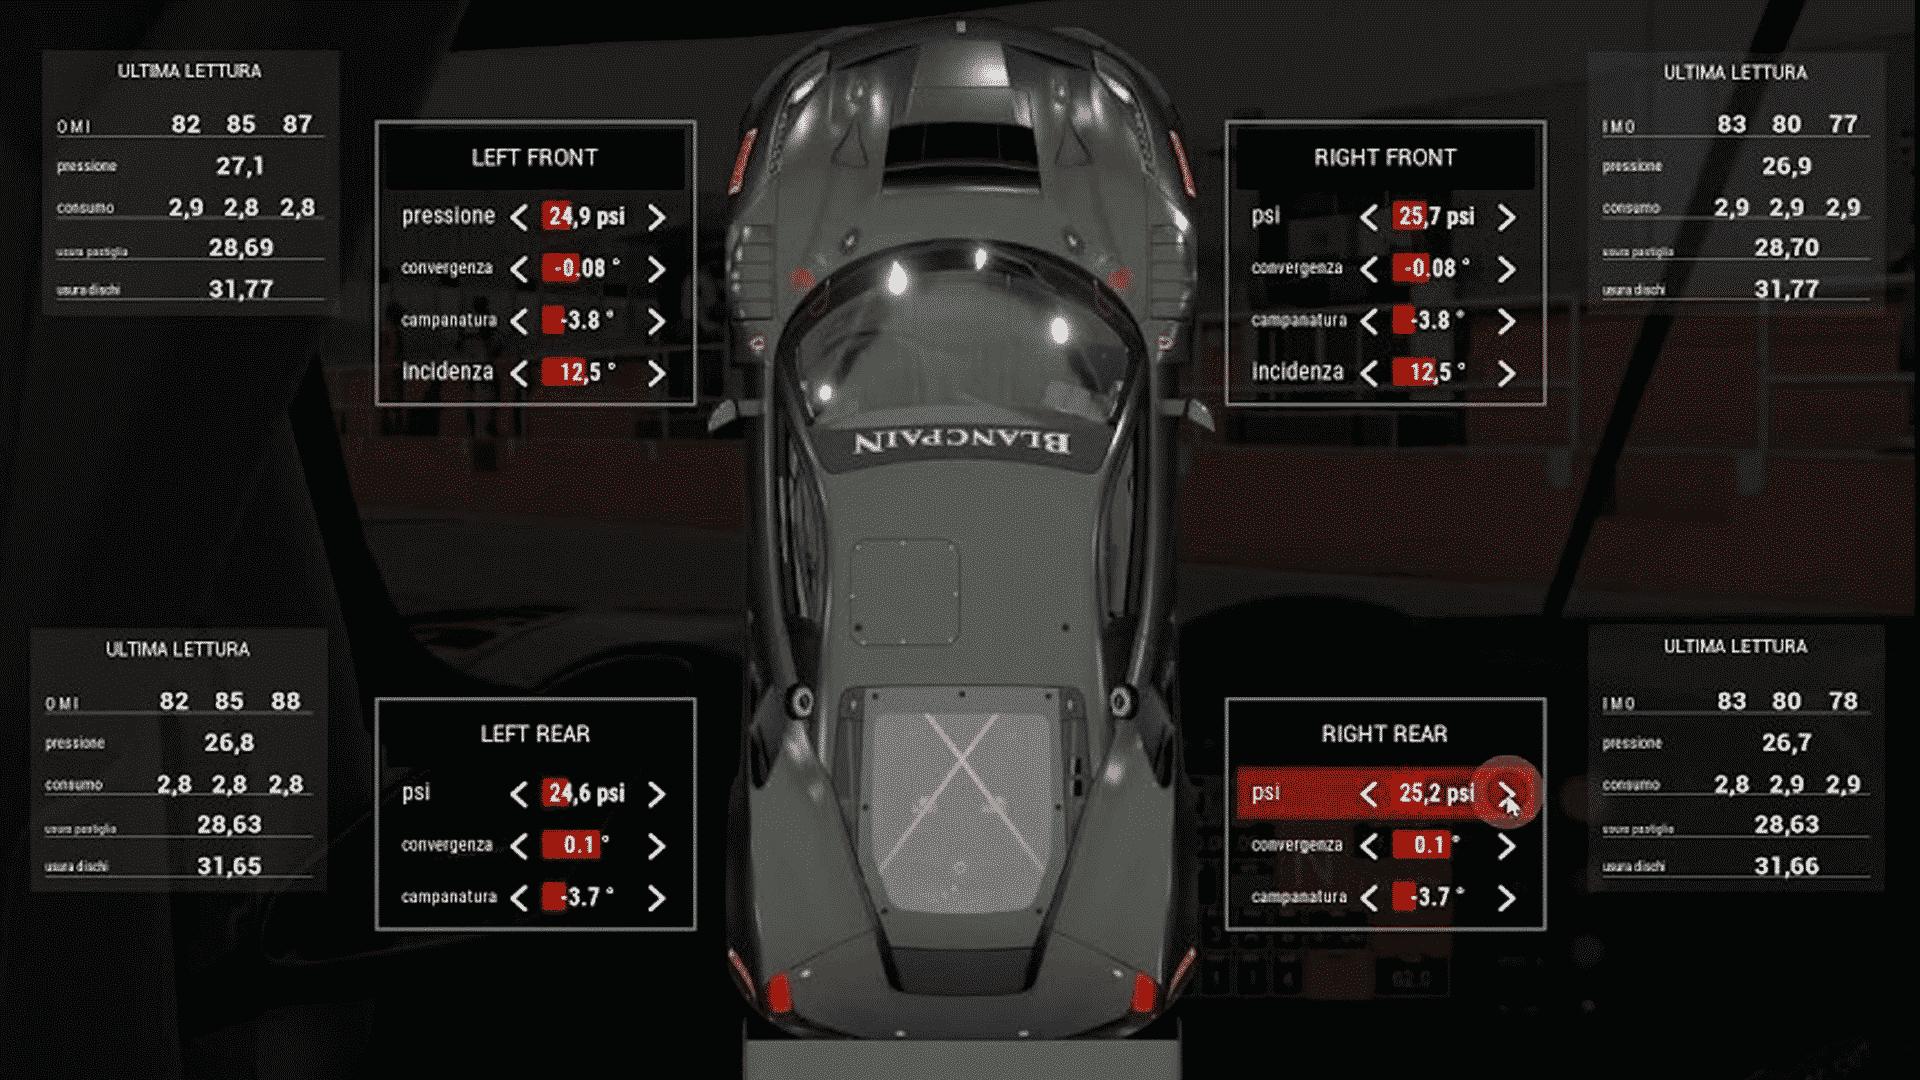 regolazione racing simulator software